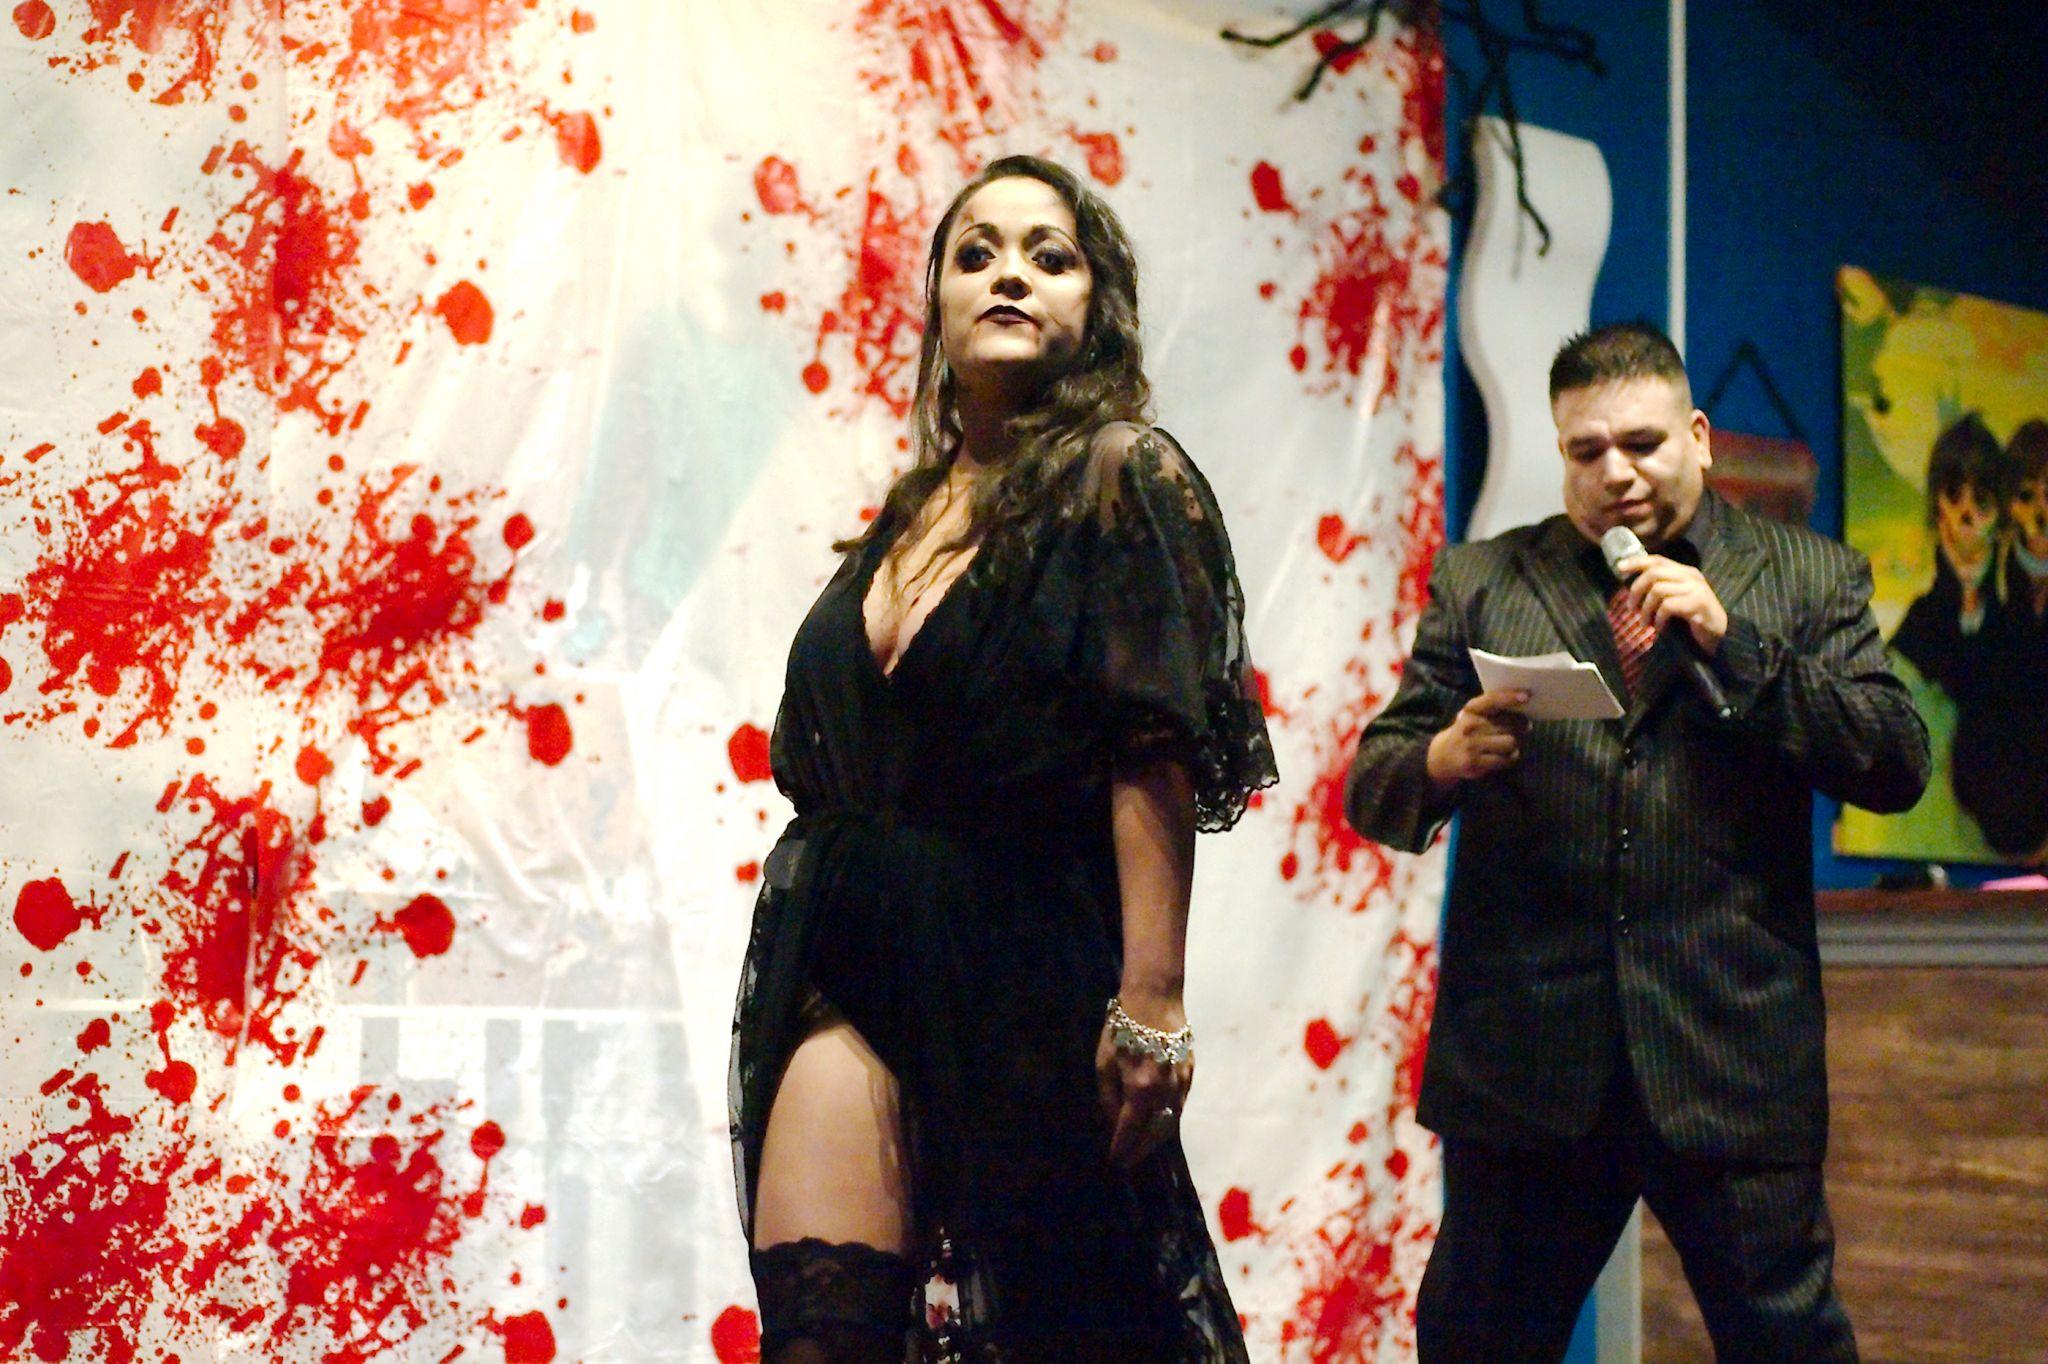 Vampires, Diwali and De Niro get Houston partying